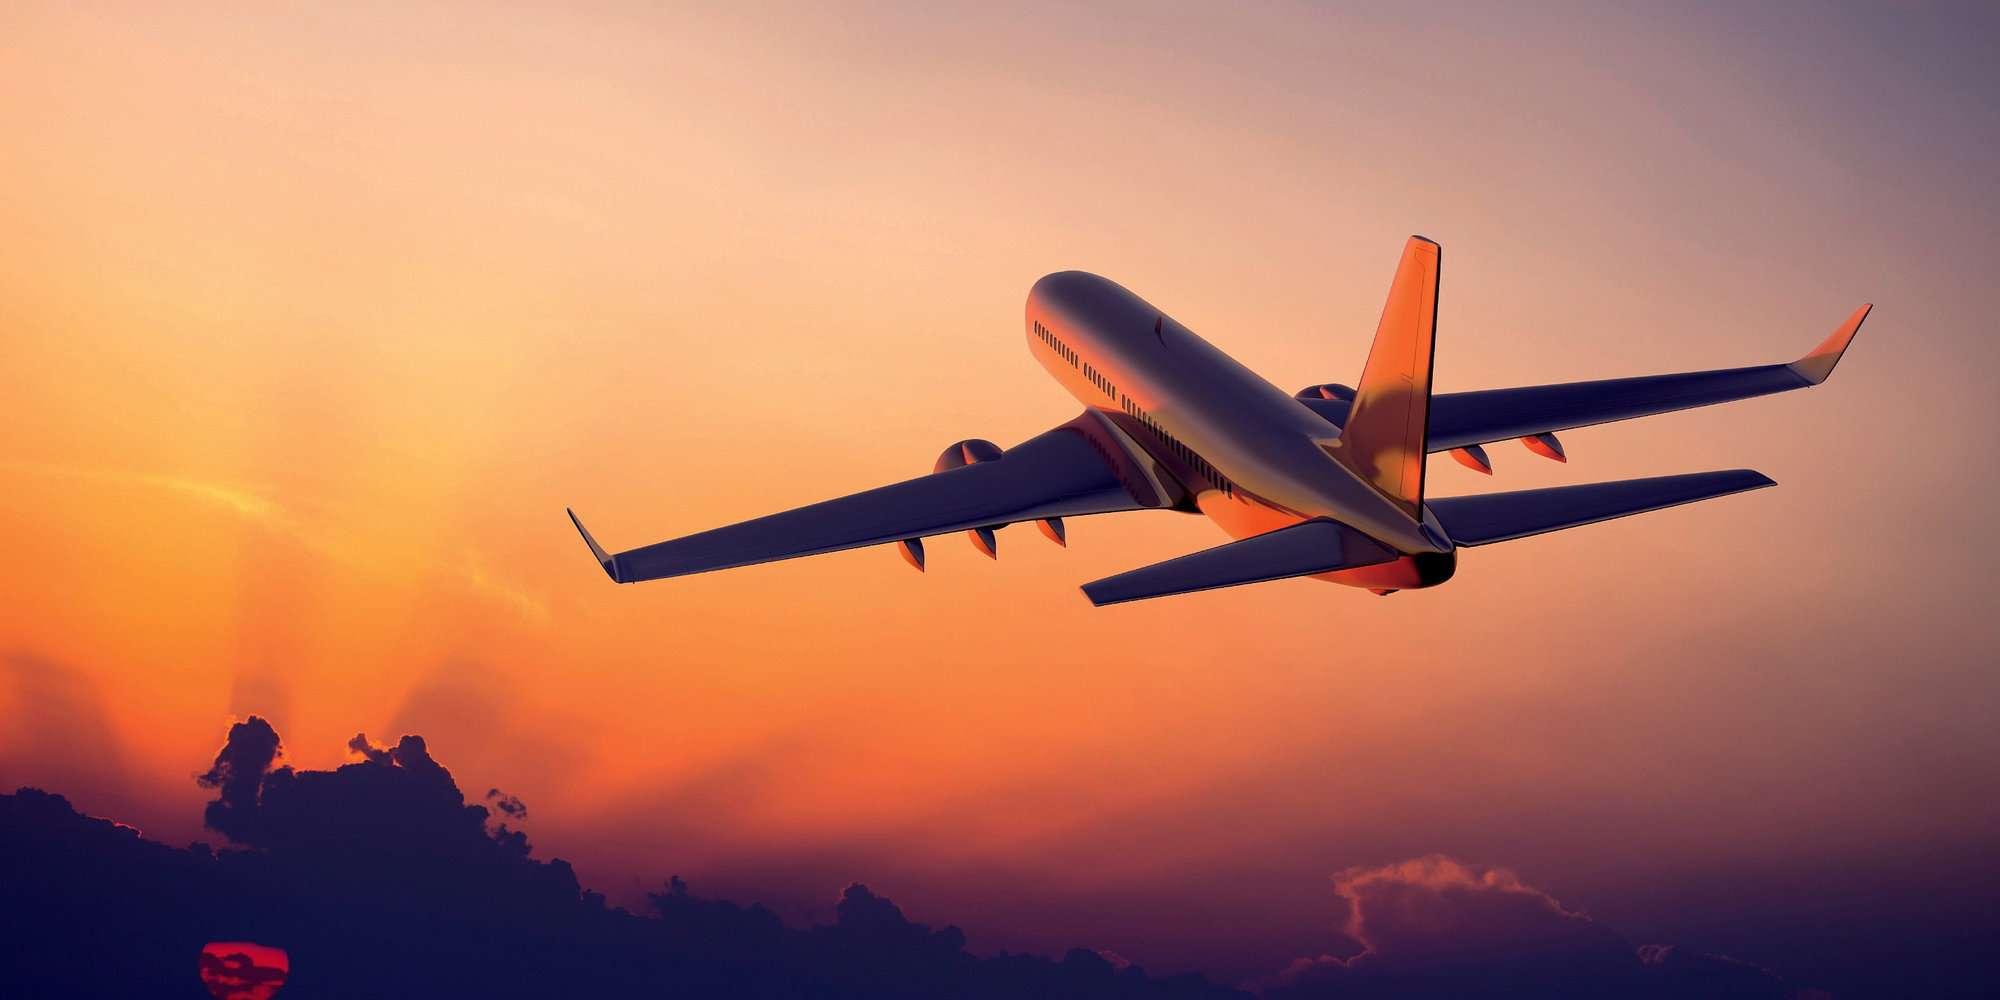 aereo in fase di salita al tramonto